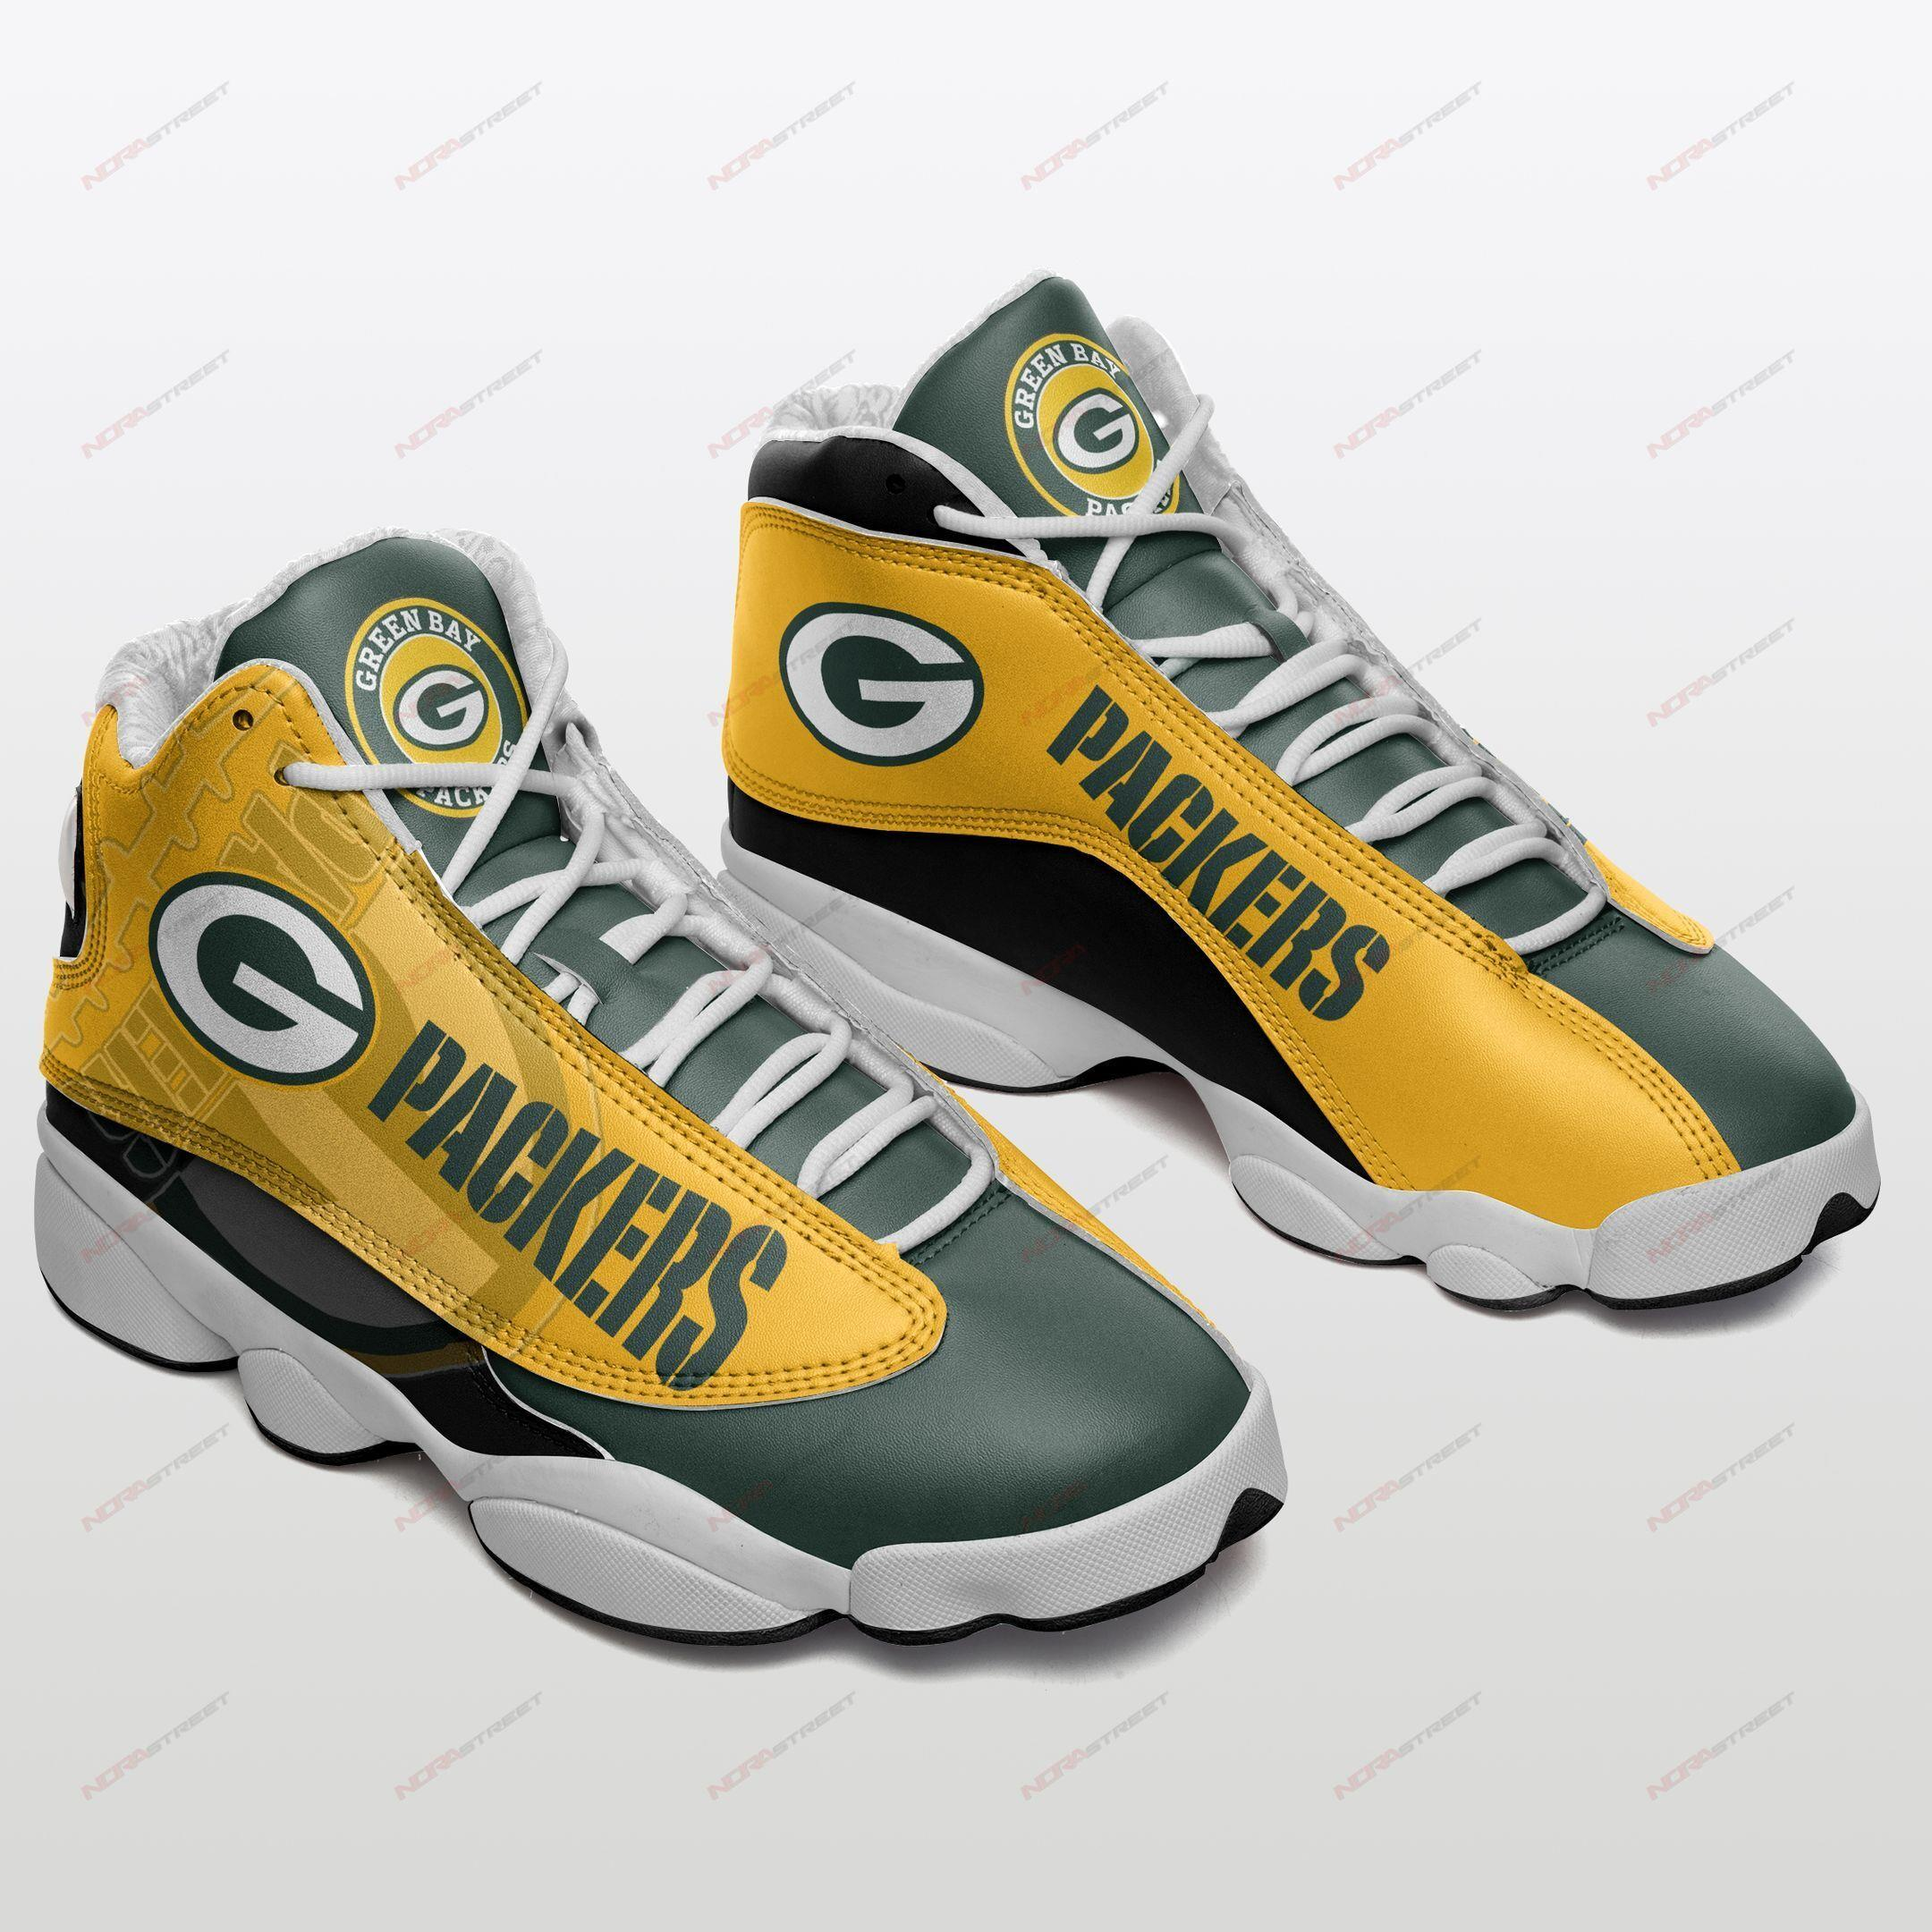 Green Bay Packers Air Jordan 13 Sneakers Sport Shoes